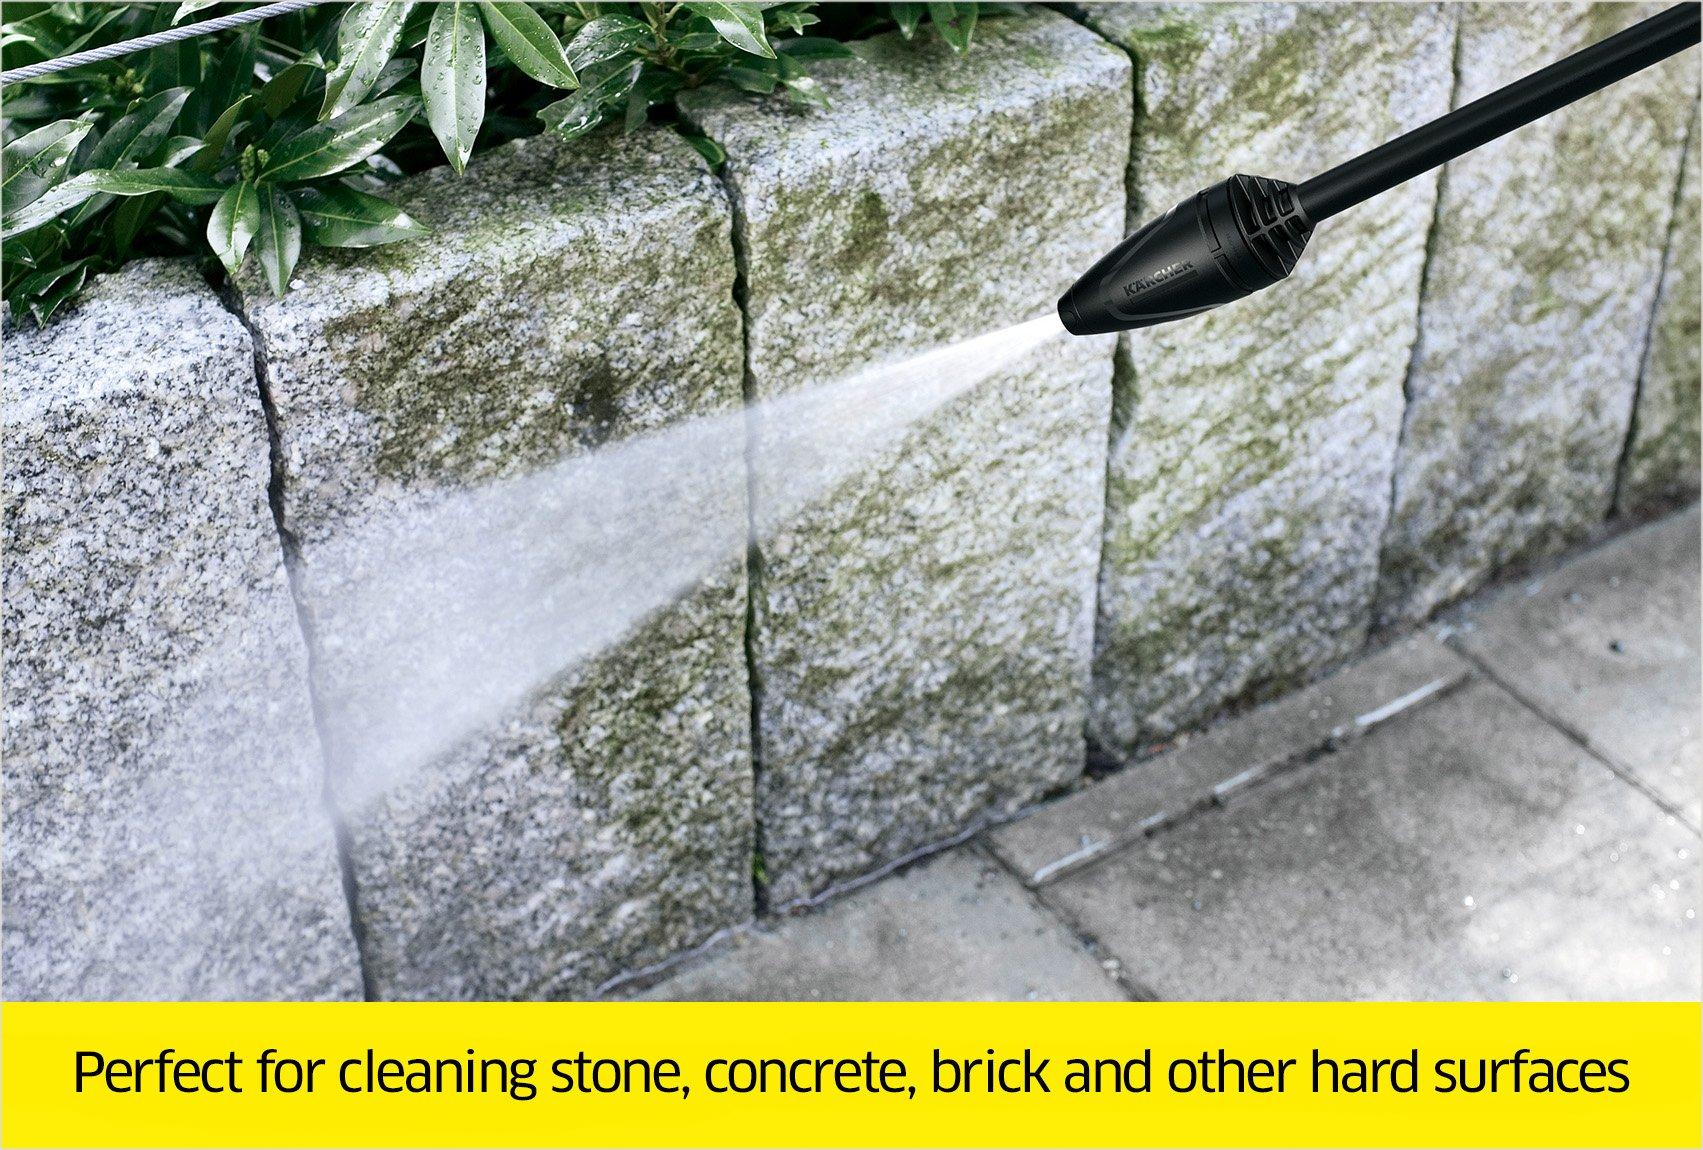 Karcher 2.644-049.0 Dirtblaster Wand Spray, Black by Karcher (Image #3)